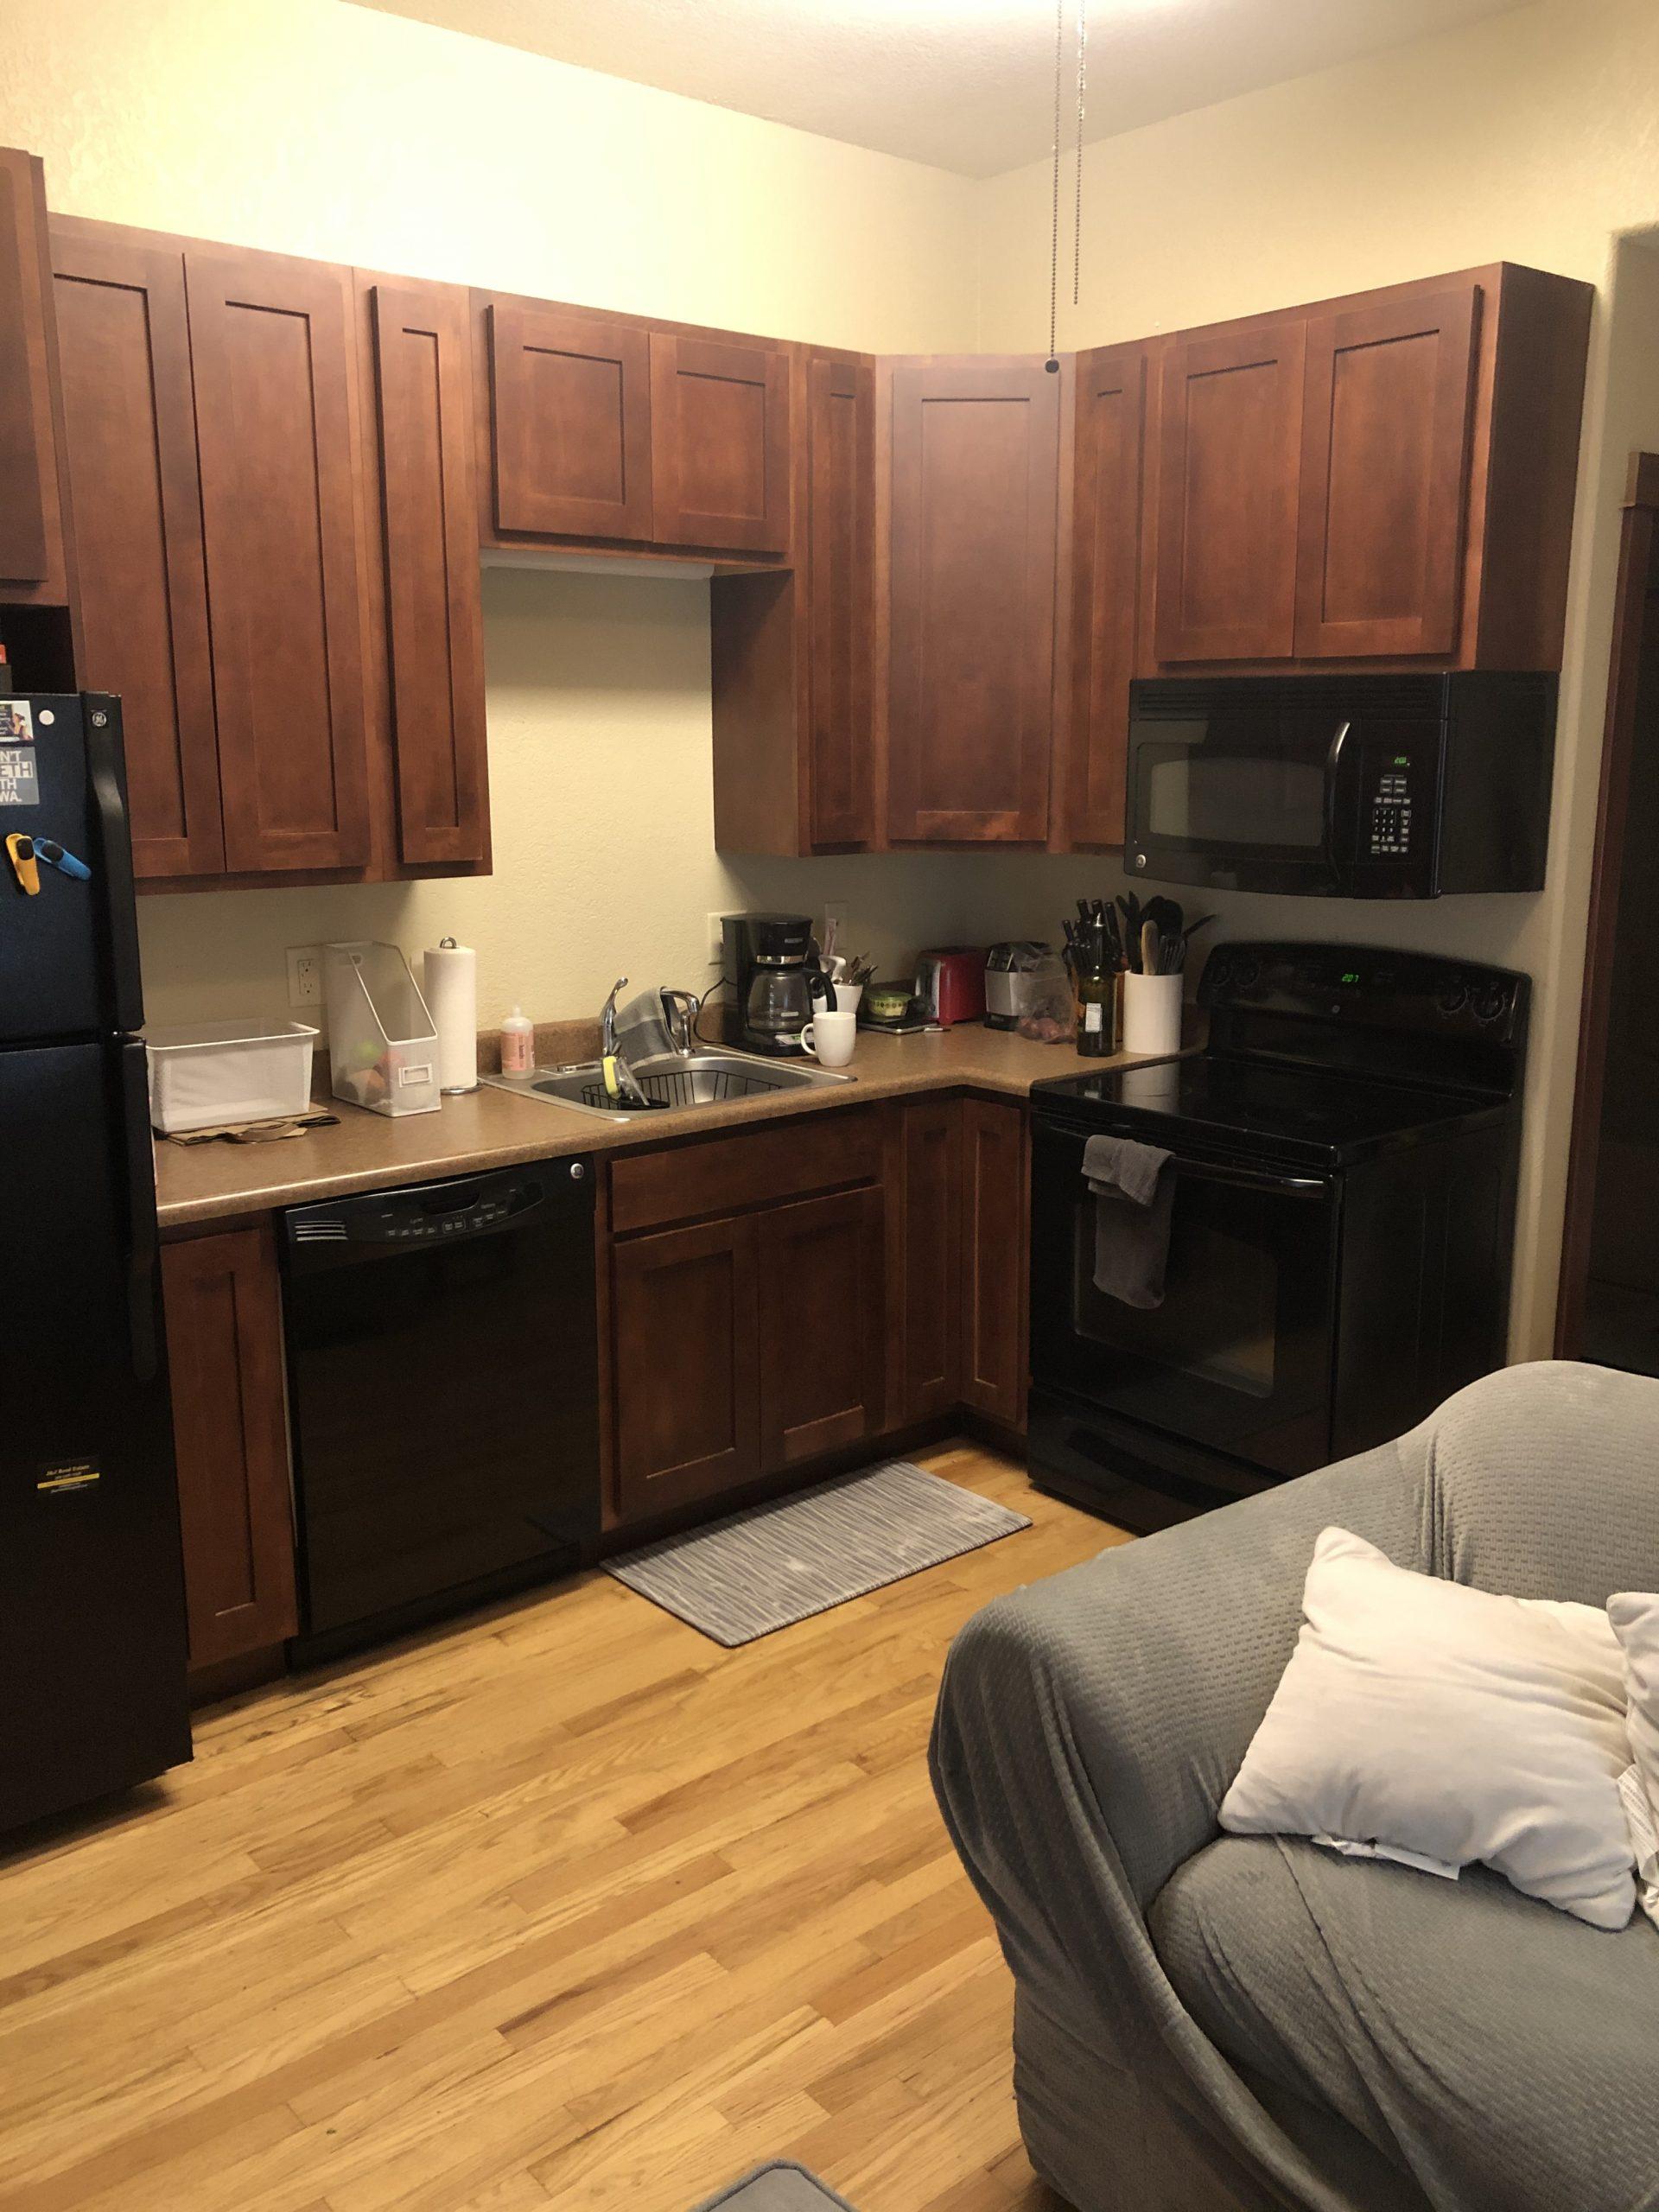 515-college-1_iowa-city_j-and-j-apartments_kitchen